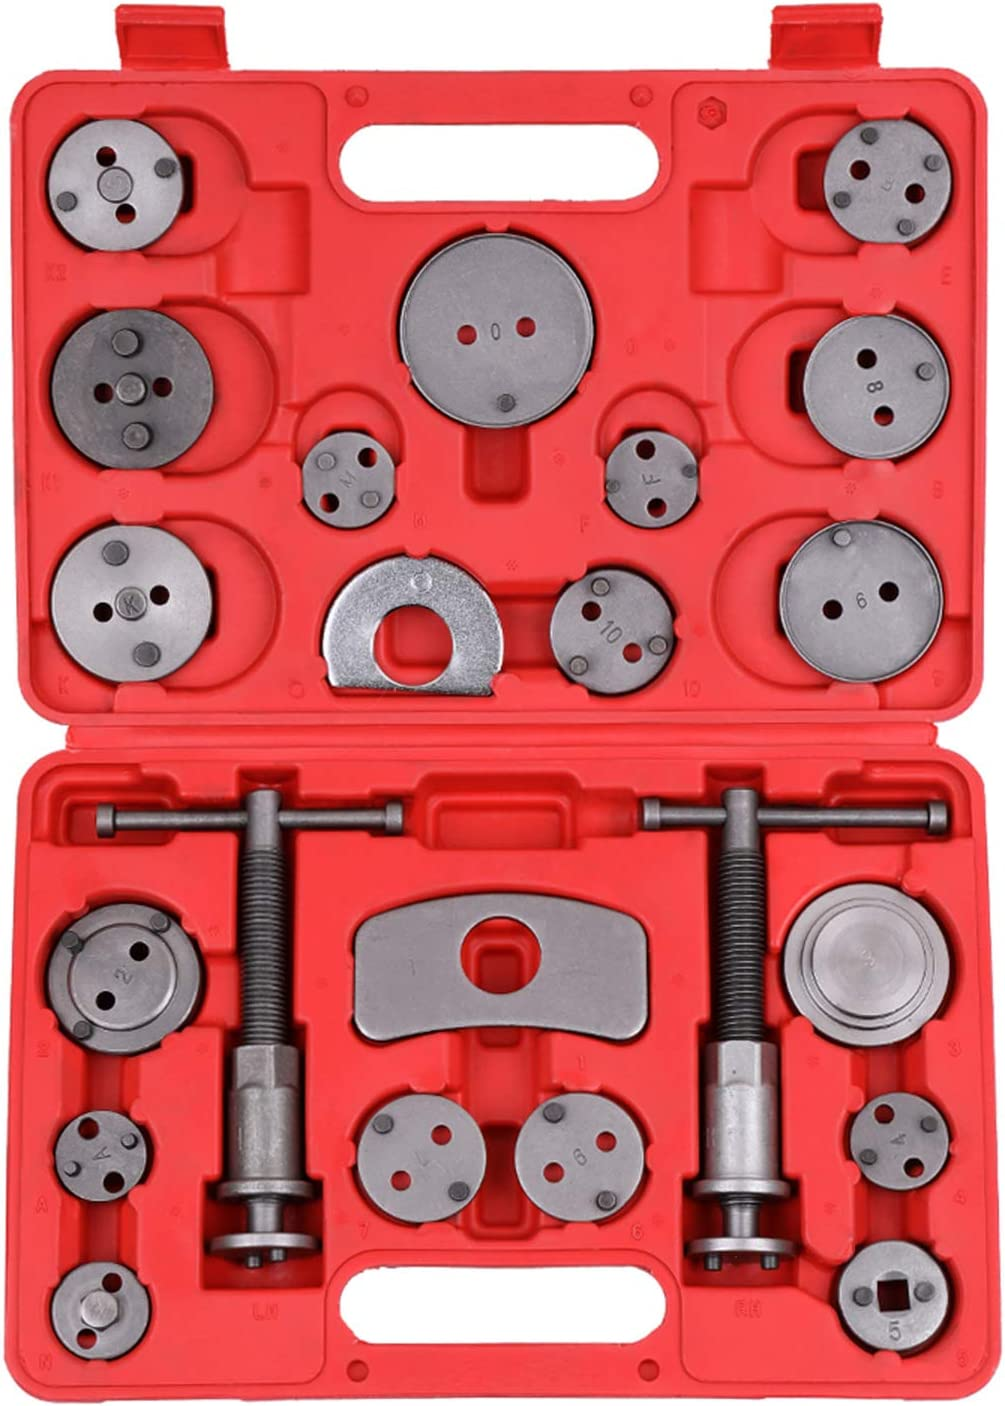 Reposicionador de Pistones de Freno, KKmoon Herramienta para Pastillas de Frenos 22pcs,Compresor Pistones Freno Kit Universal